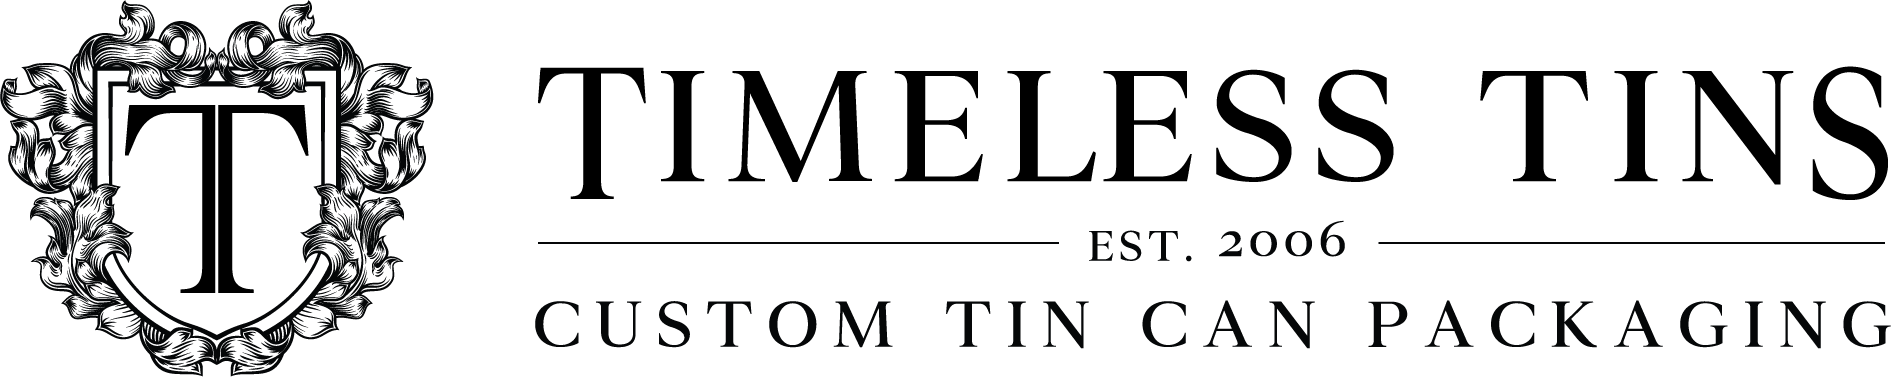 Timeless Tins logo